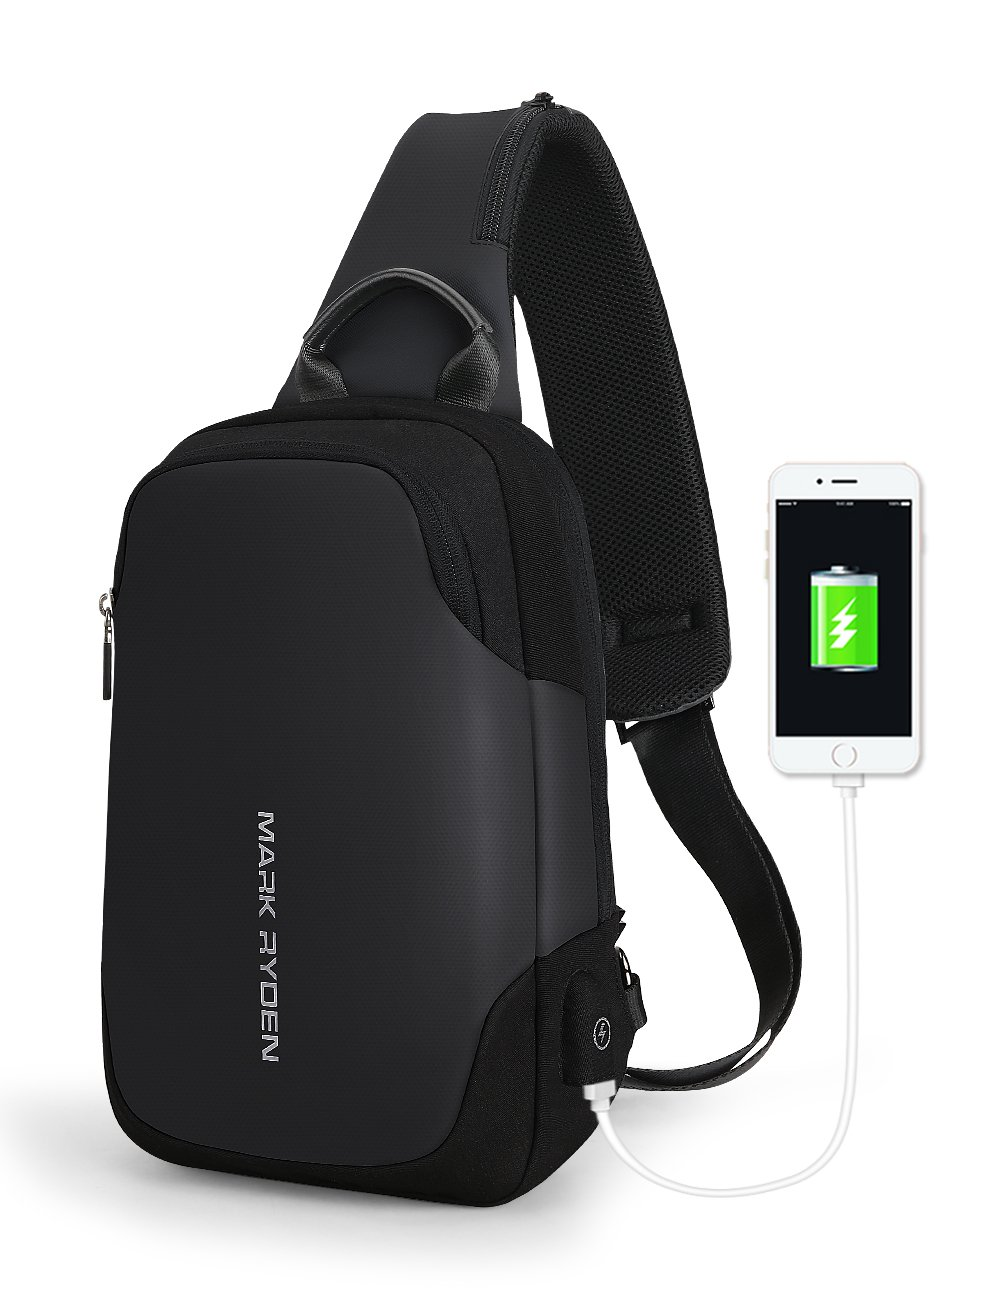 Mark Ryden Anti-theft Sling Chest Bag Handbag for Men Waterproof Crossbody Travel Shoulder Bag Fit for 9.7'' ipad